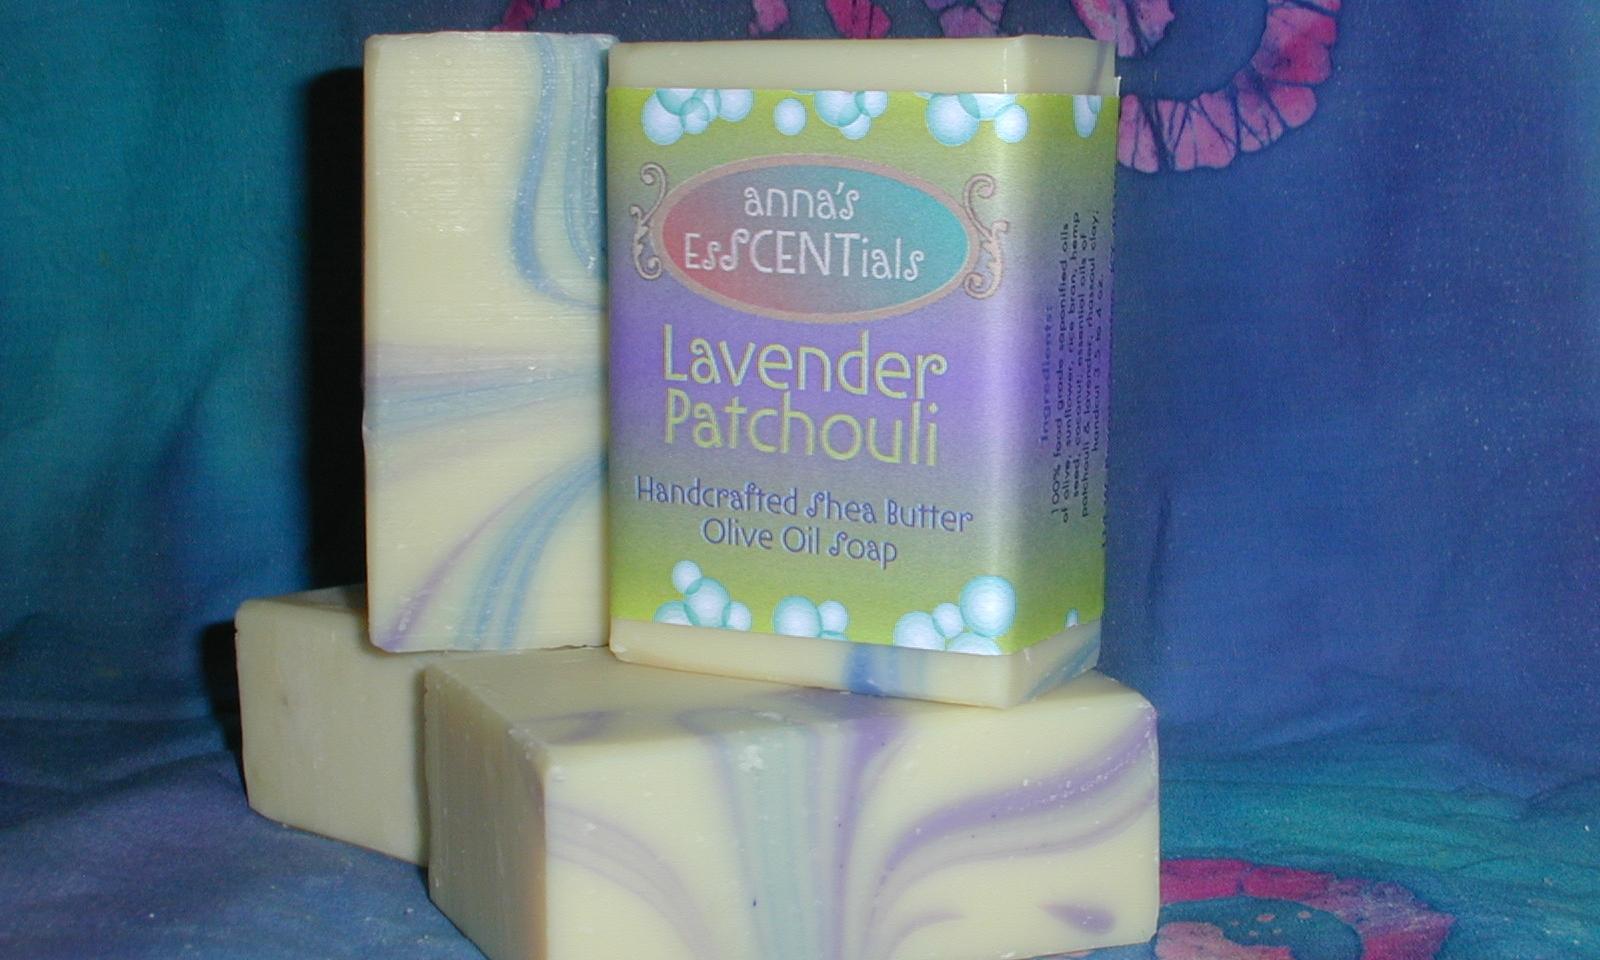 LavenderPatchouli5.jpg